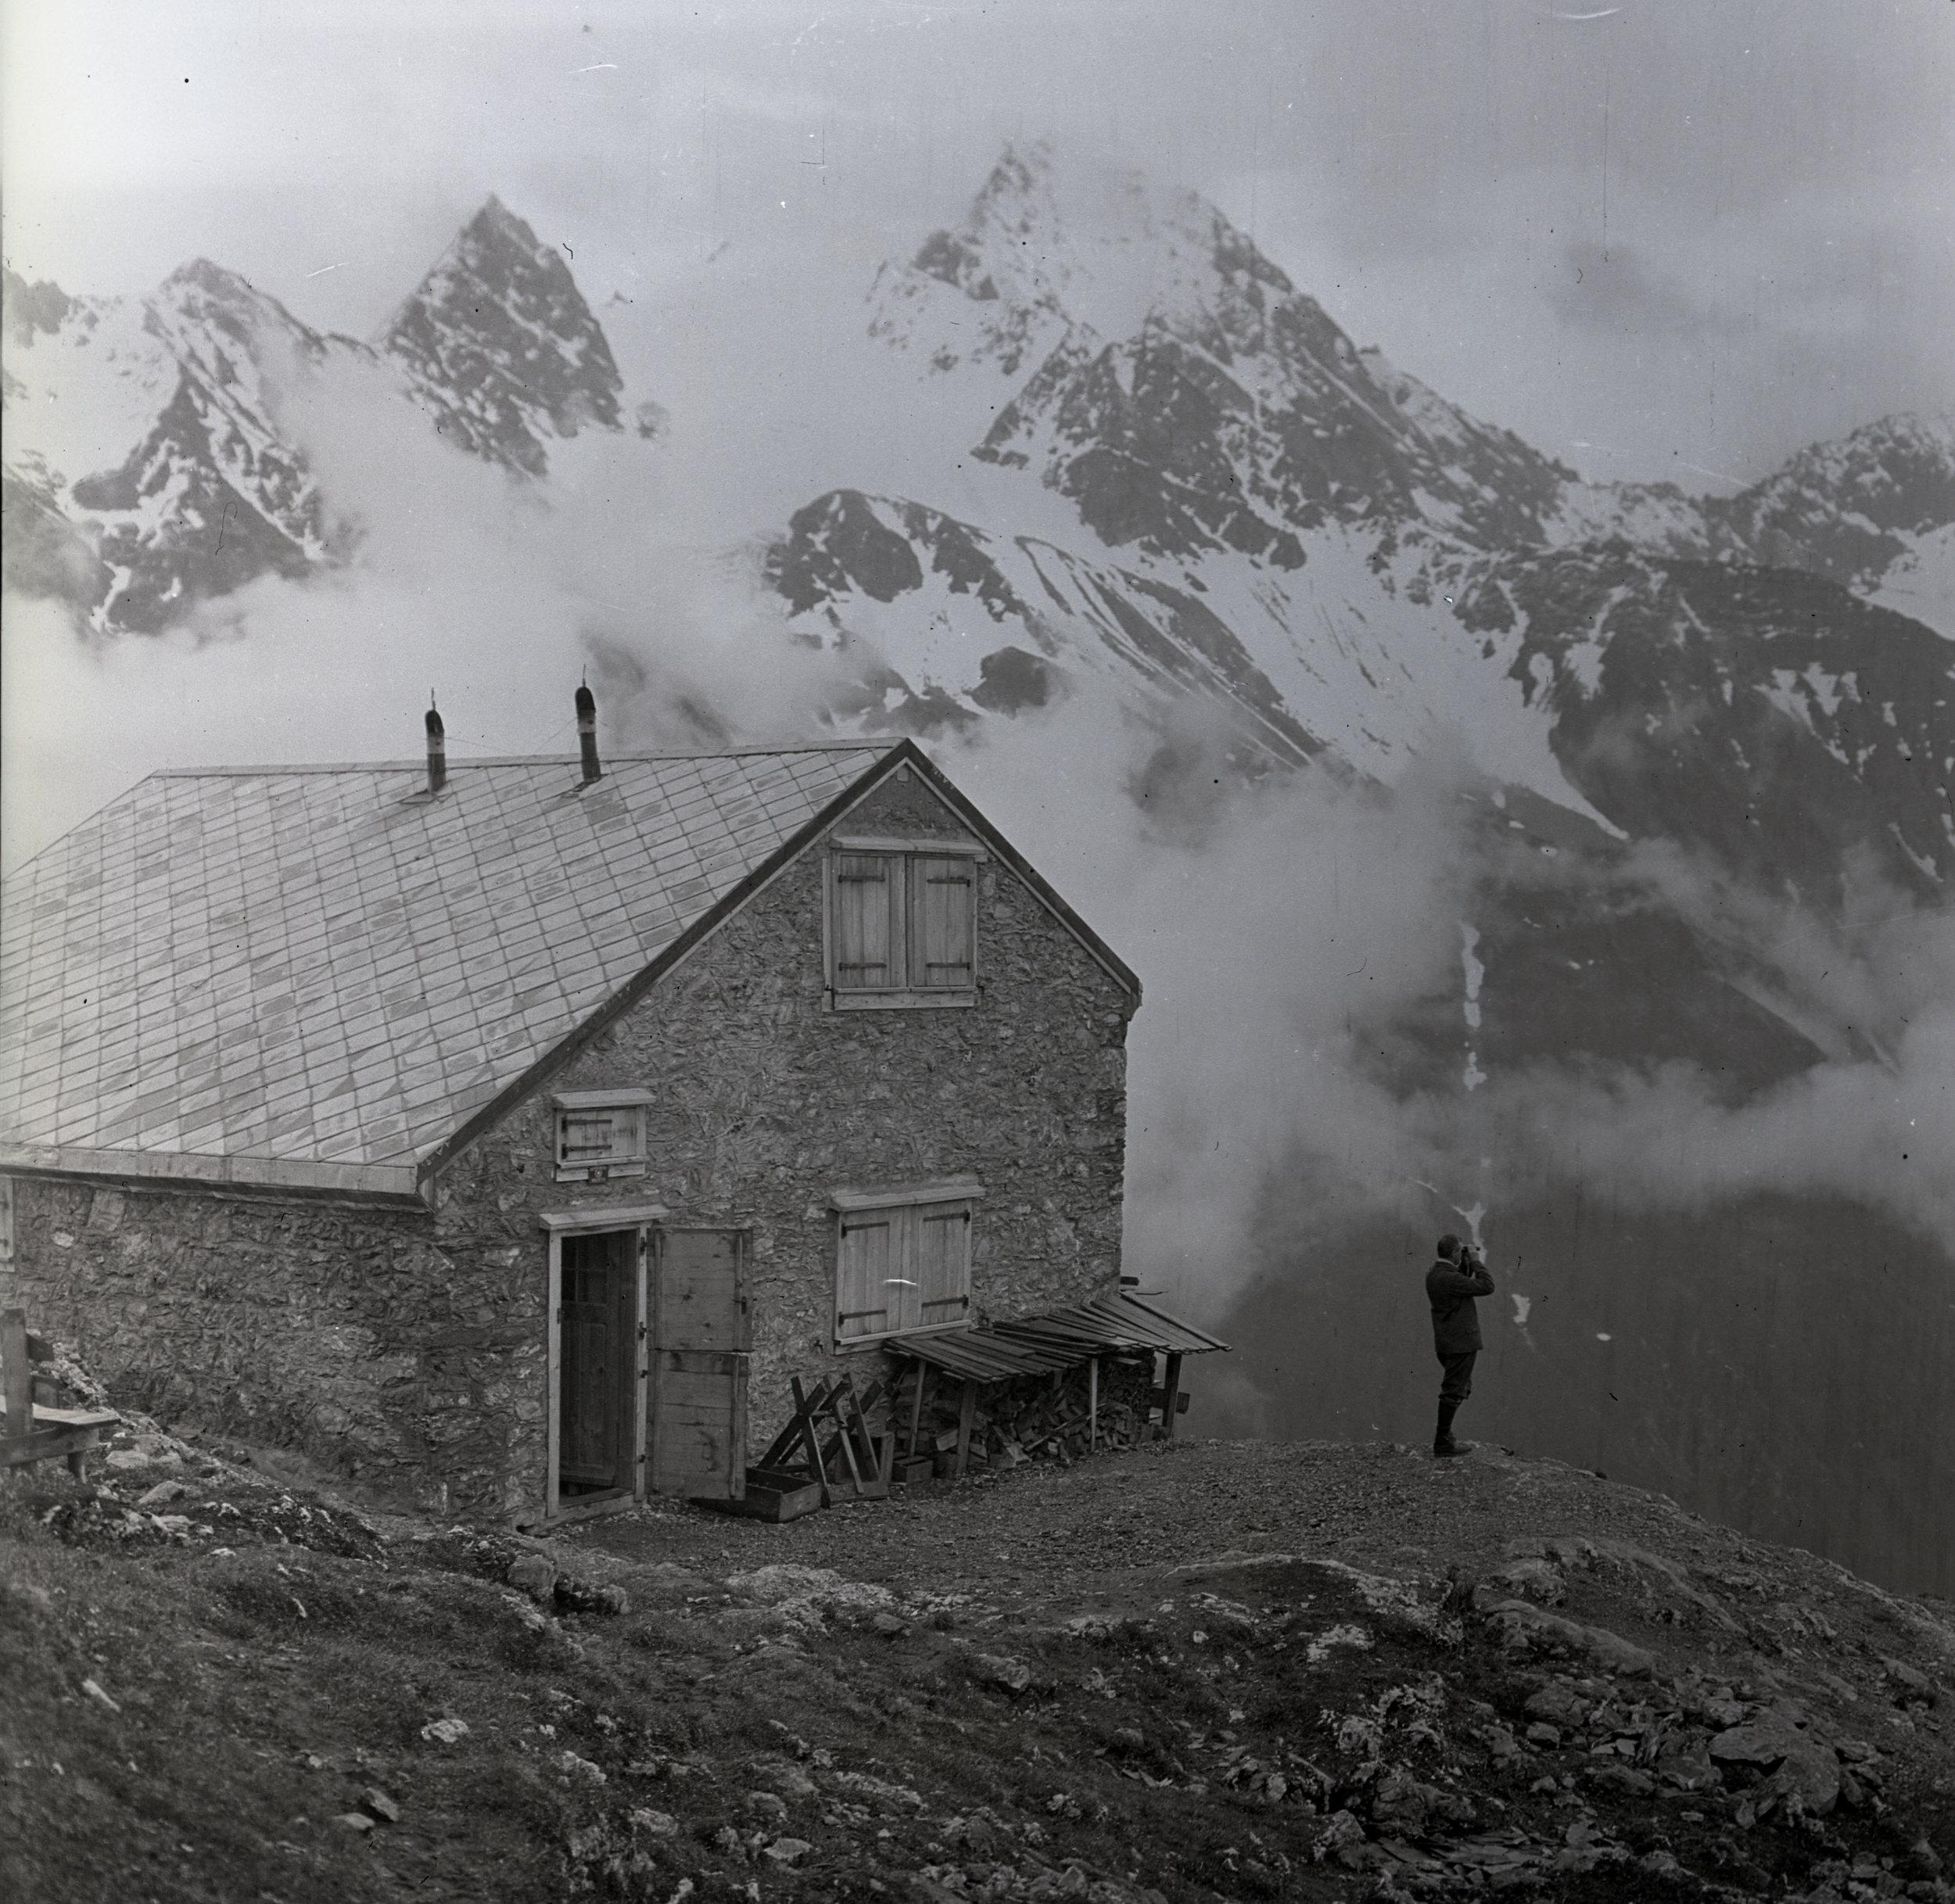 Windgällenhütte, circa 1911